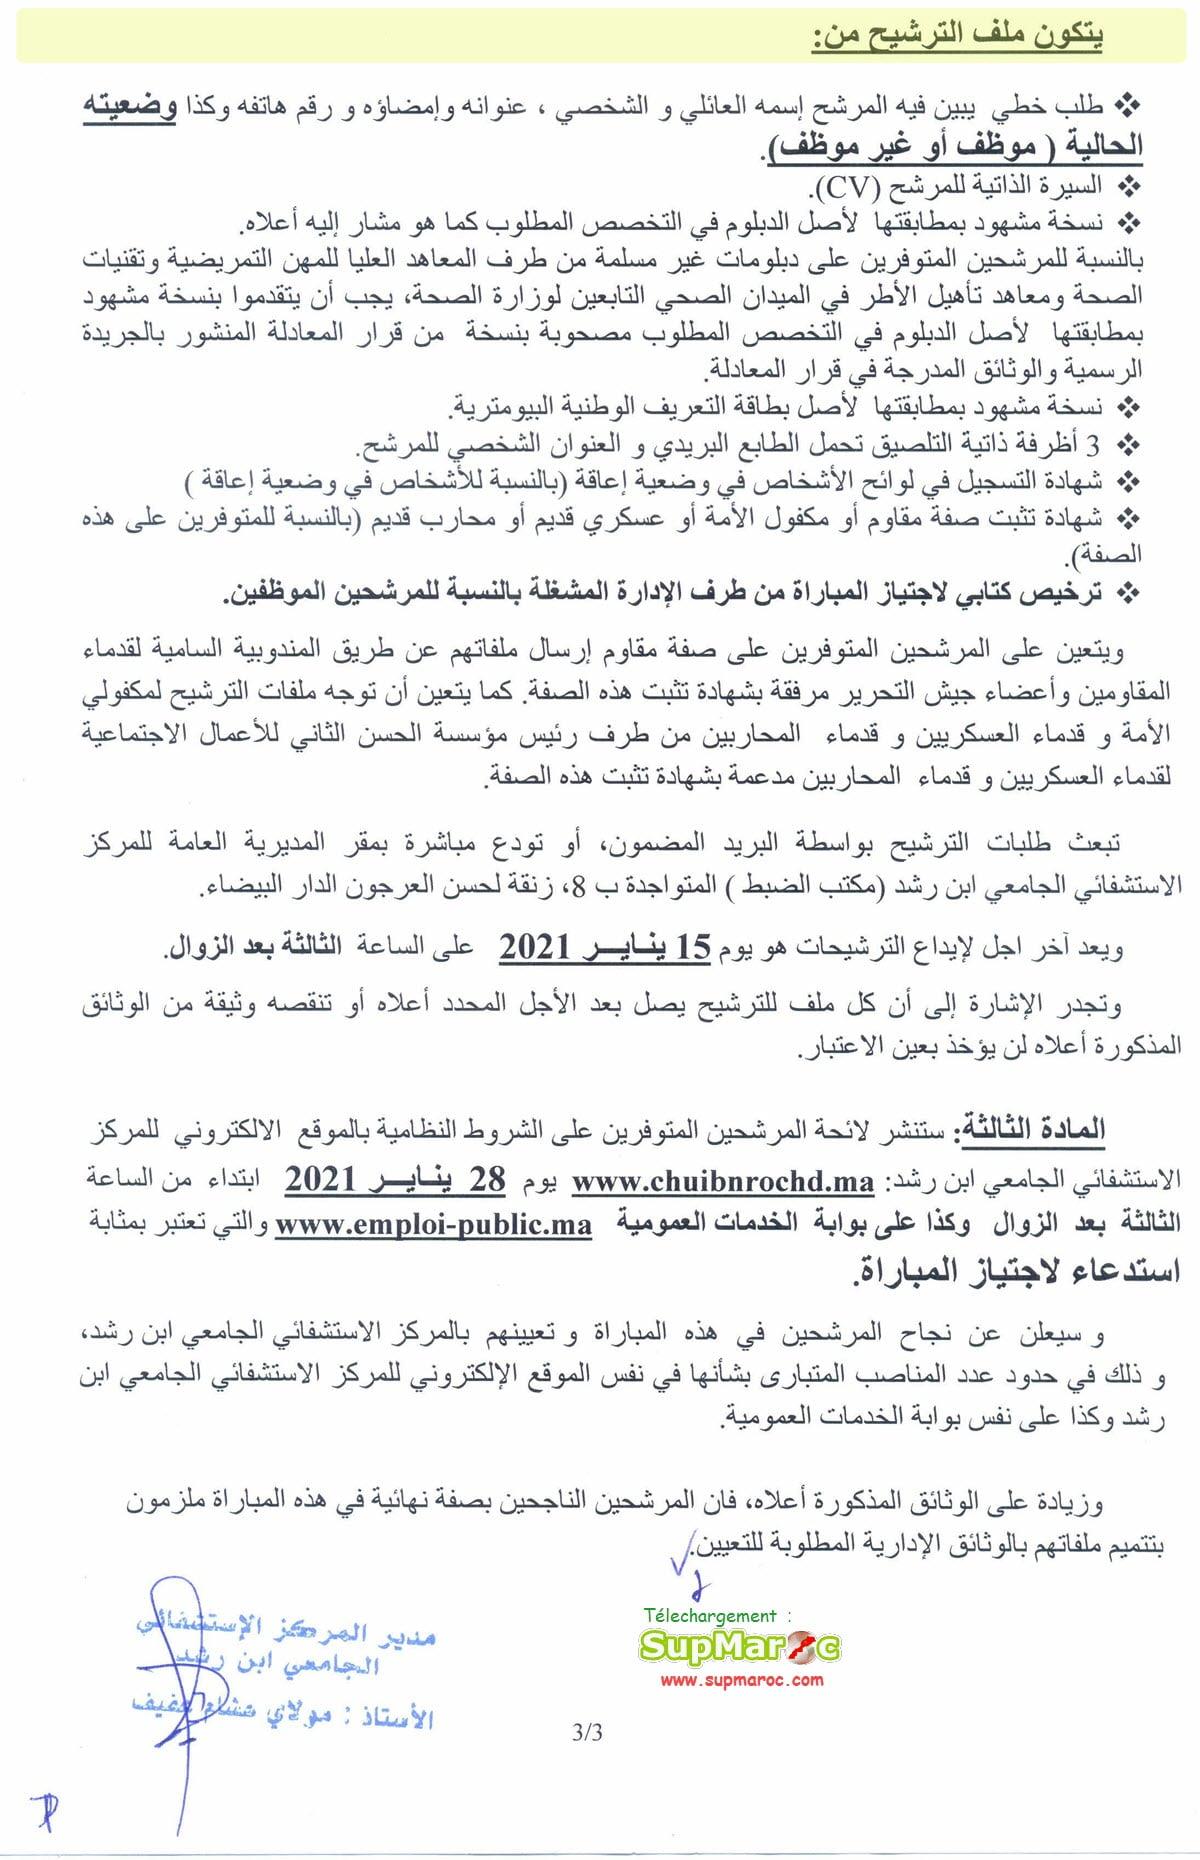 Concours recrutement 152 postes CHU Ibn Rochd 2021 ابن رشد مباراة التوظيف في الدرجة الأولى (السلم 10) ضمن إطار الممرضين، إطار تقنيي الصحة ،إطار المروضين، إطار المساعدين في المجال الطبي الاجتماعي